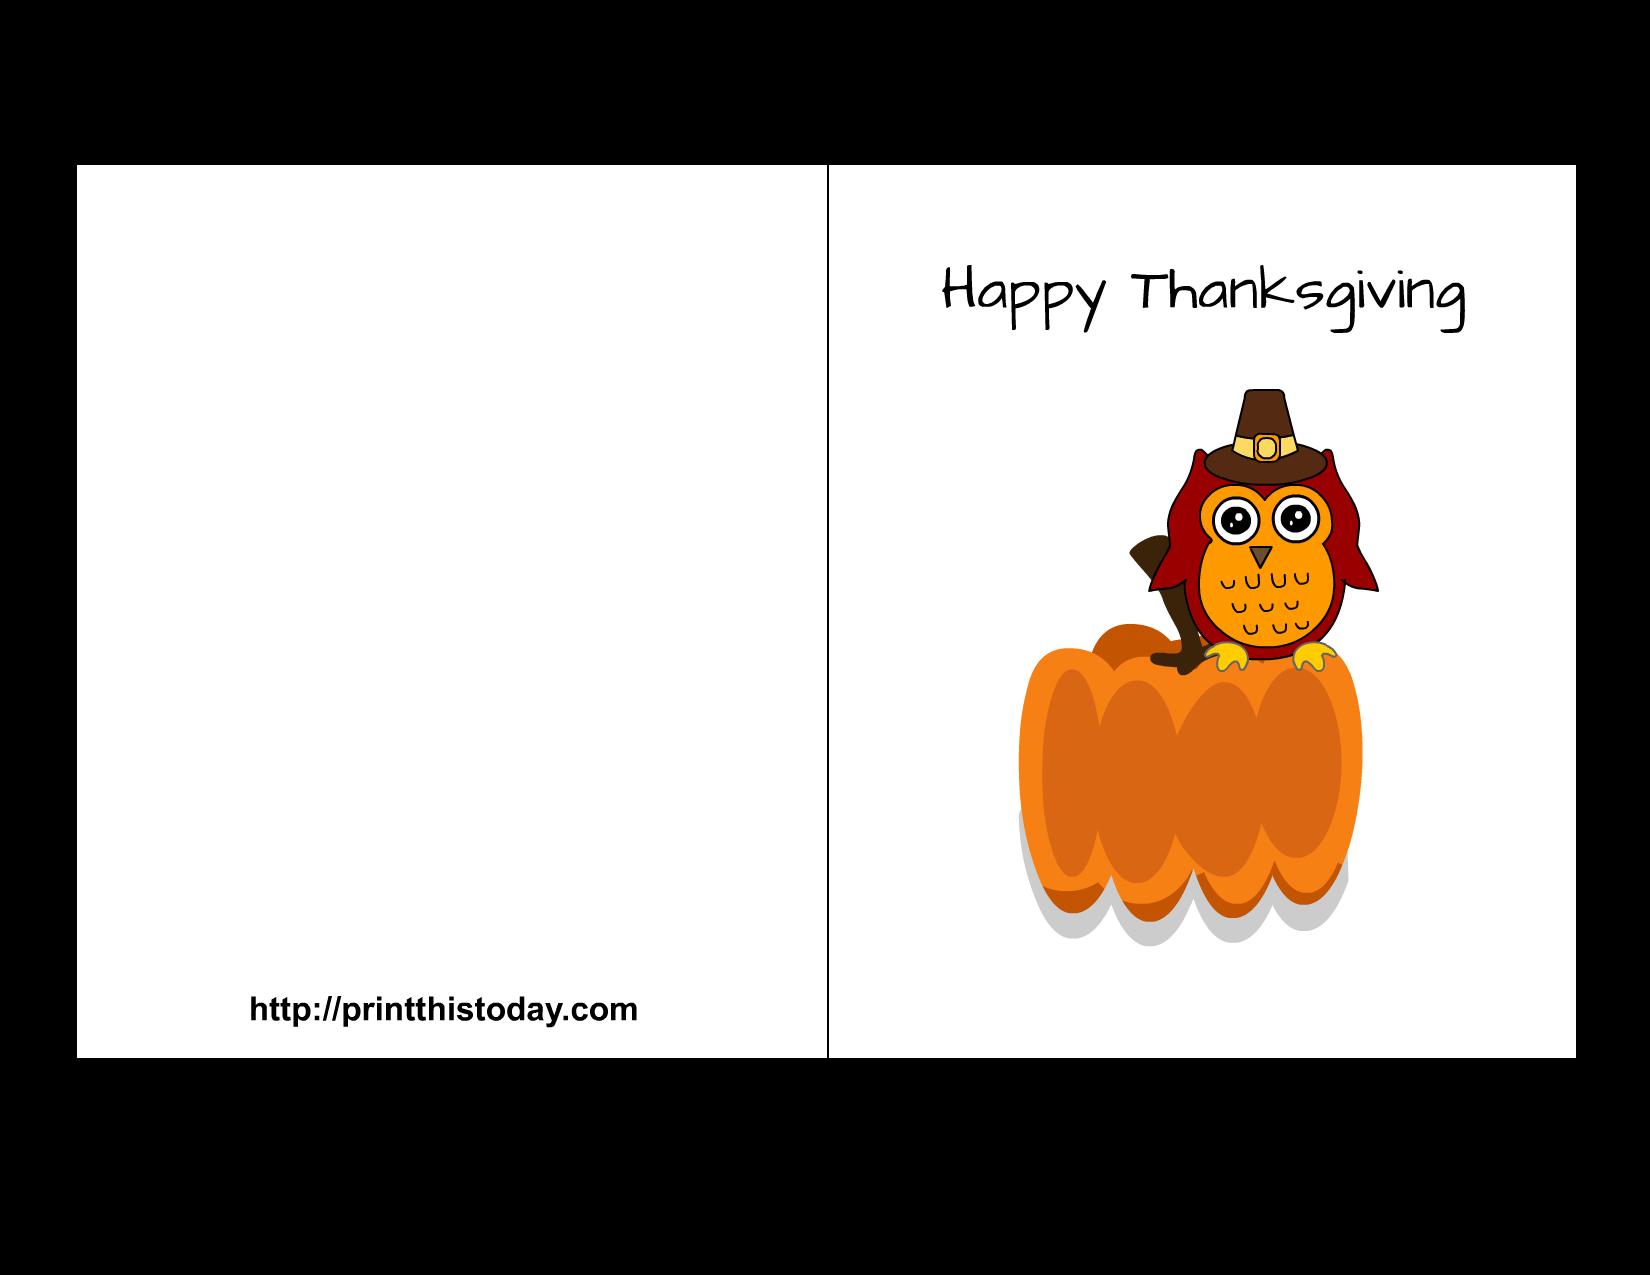 Thanksgiving clipart card for kids printable jpg library stock Free Printable Thanksgiving Cards jpg library stock